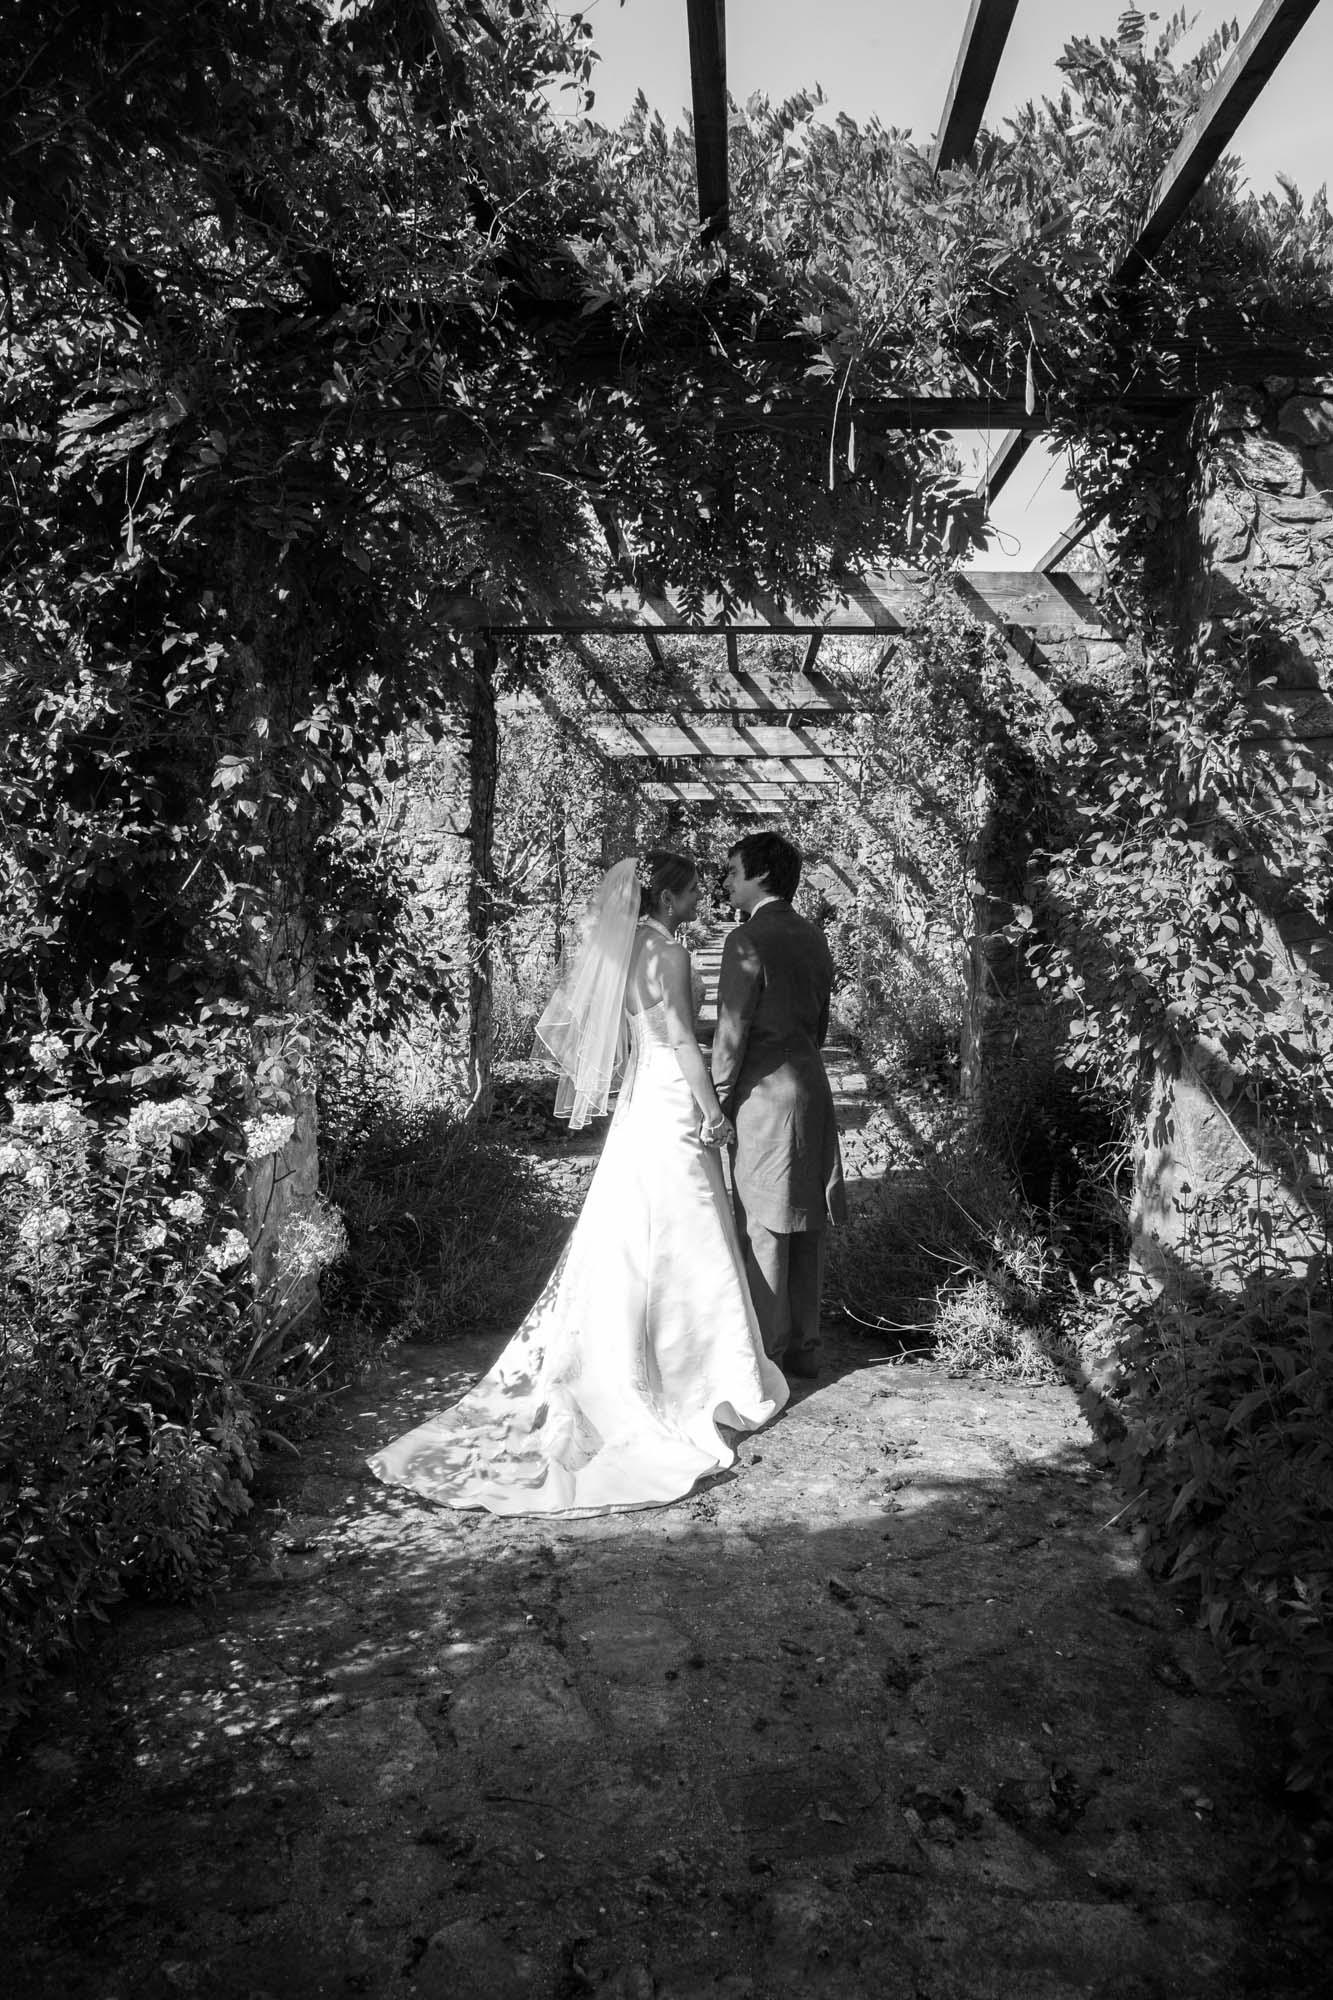 weddings-couples-love-photographer-oxford-london-jonathan-self-photography-77.jpg